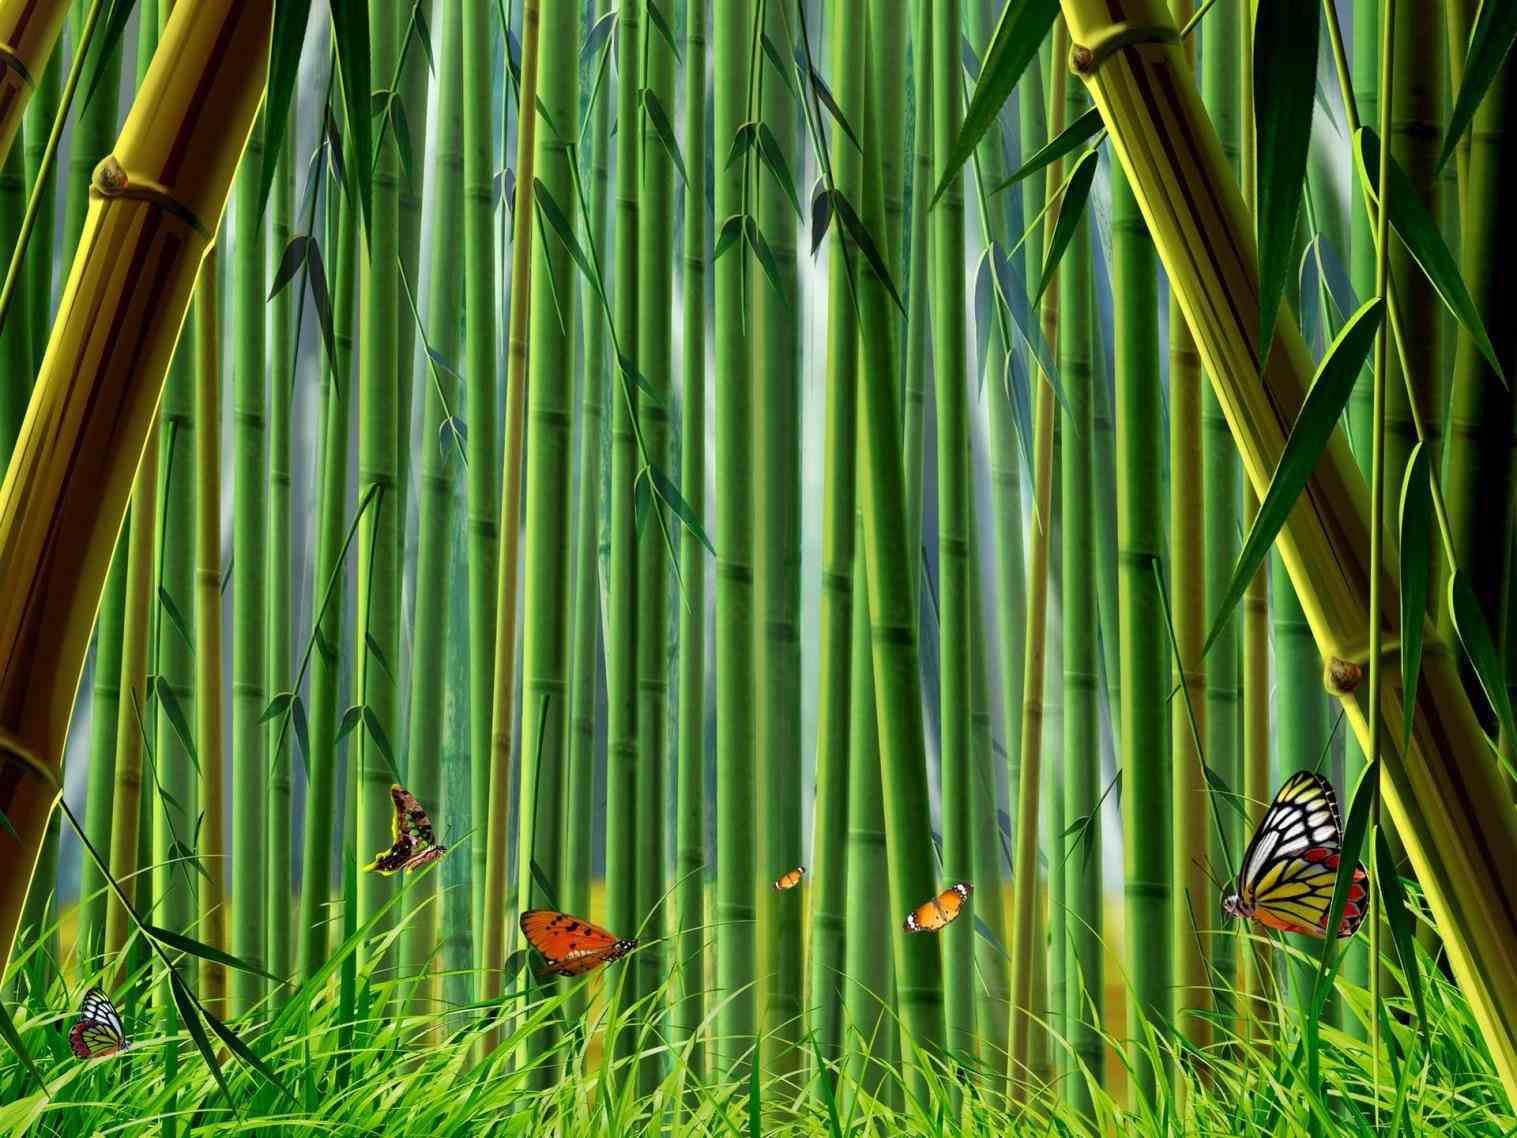 Bamboo bamboo wallpaper